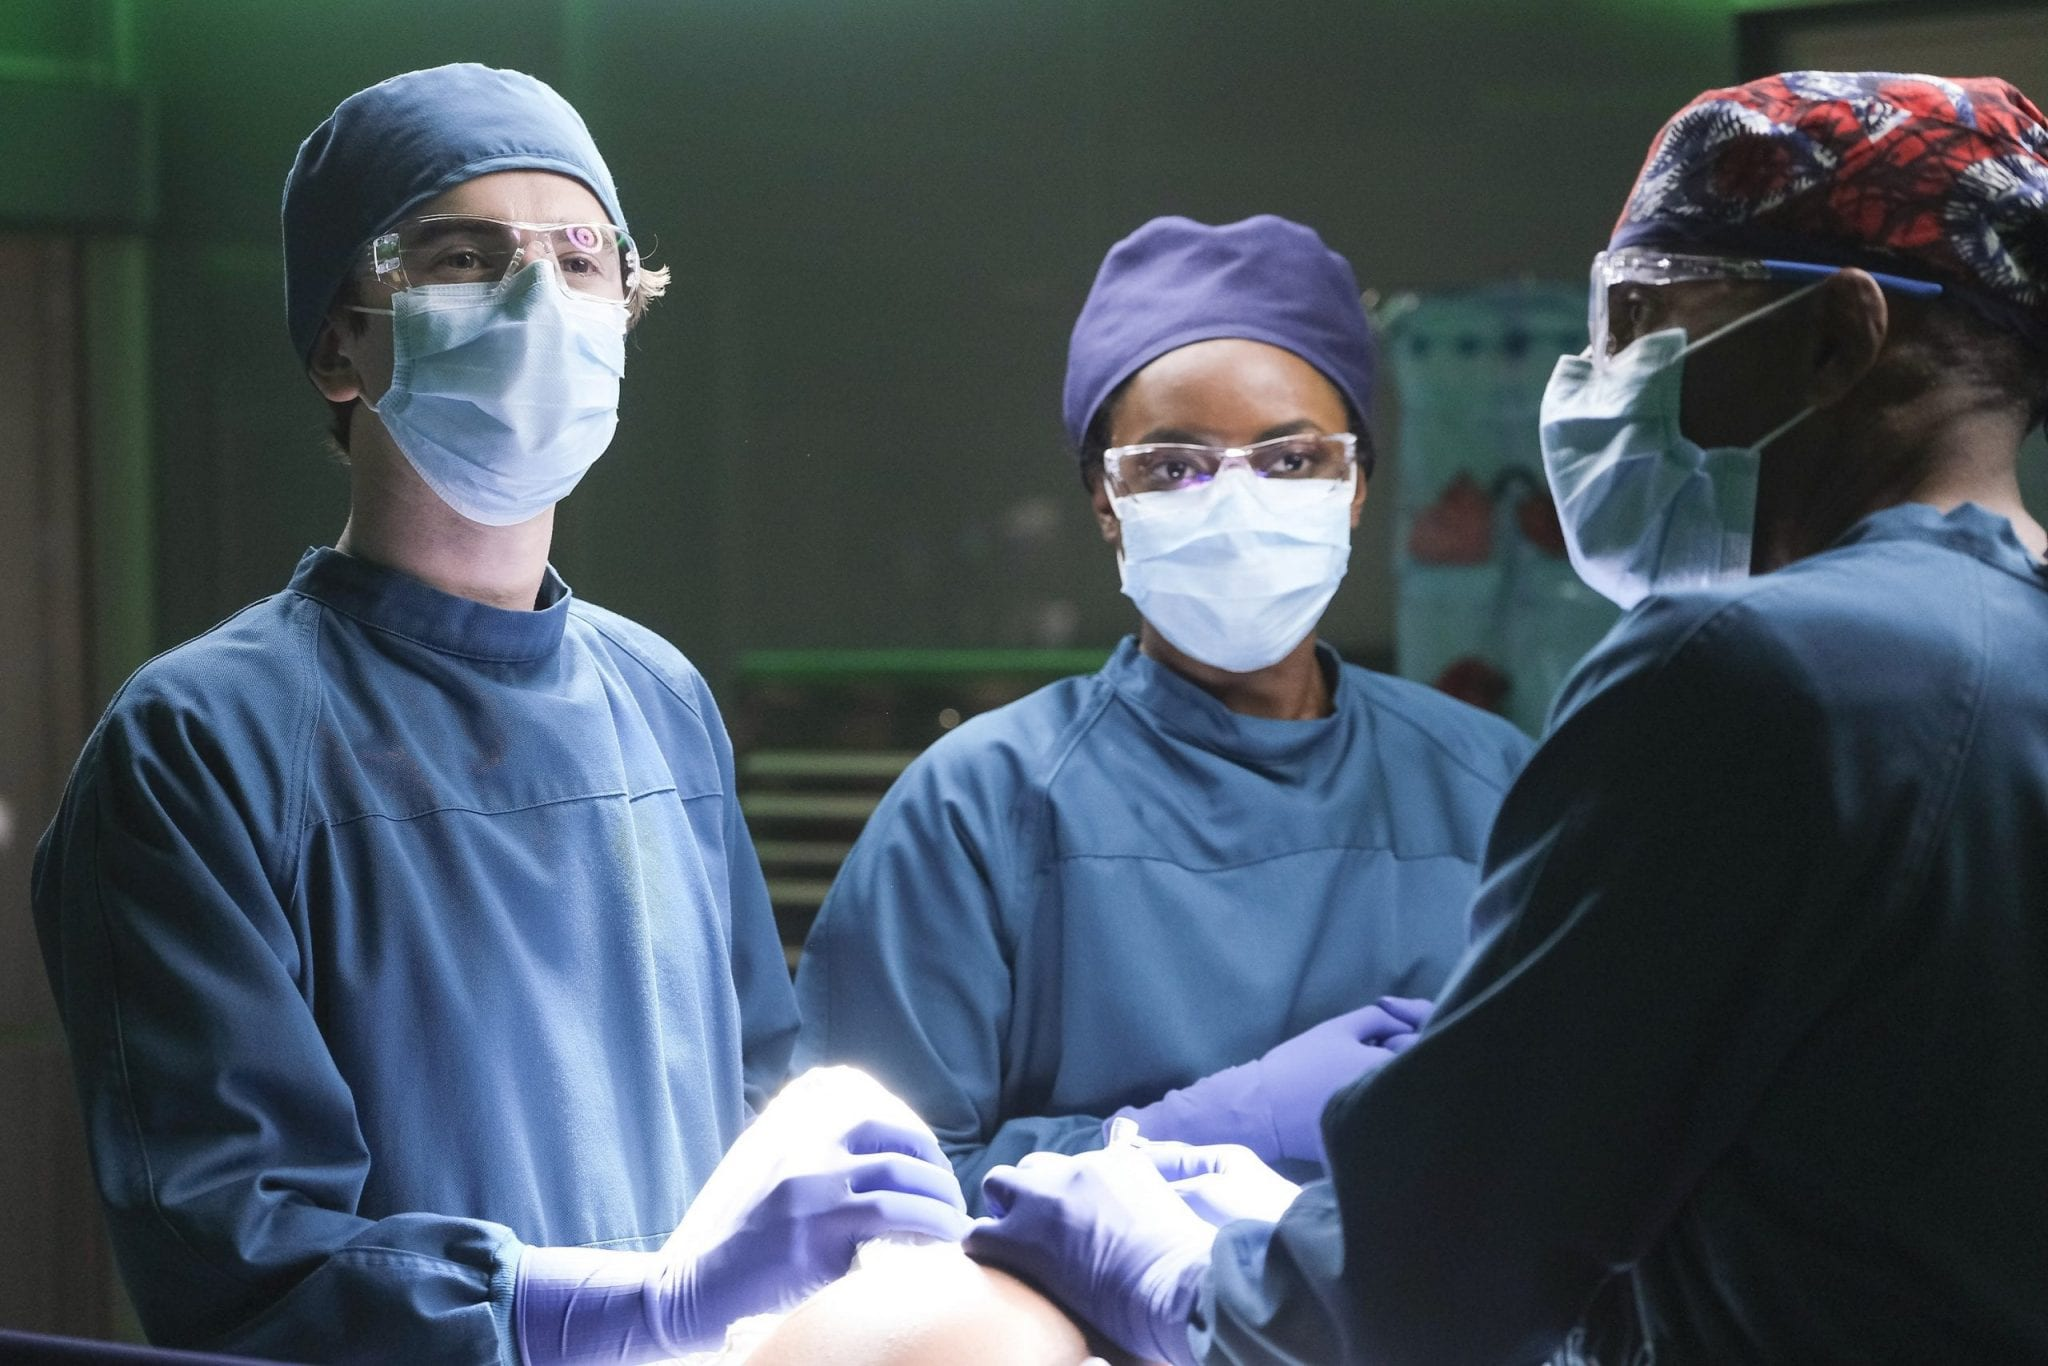 SerieTivu: The Good Doctor 4 quarta serata. Con protagonista Freddie Highmore nei panni del dottor Shaun Murphy, in prima visione assoluta su RaiDue